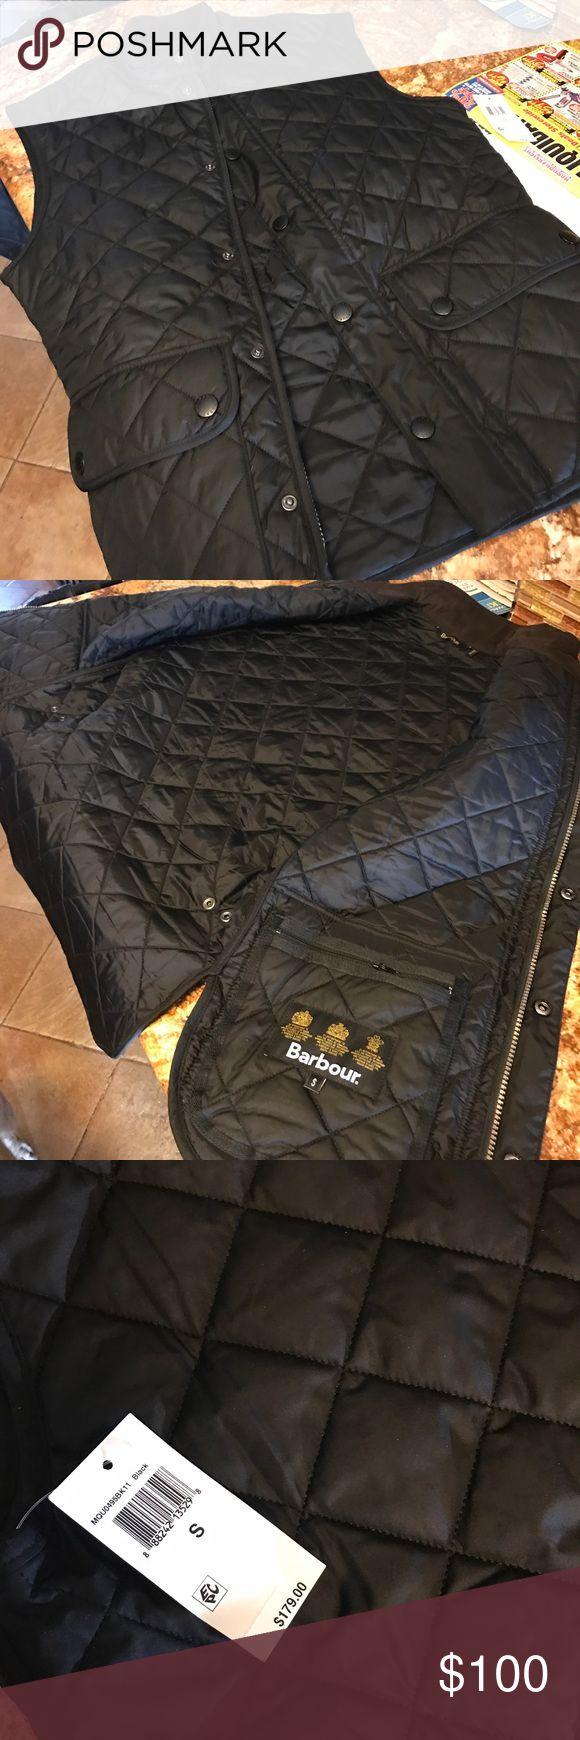 Barbour vest from Bloomingdales Brand new Barbour Jackets & Coats Vests